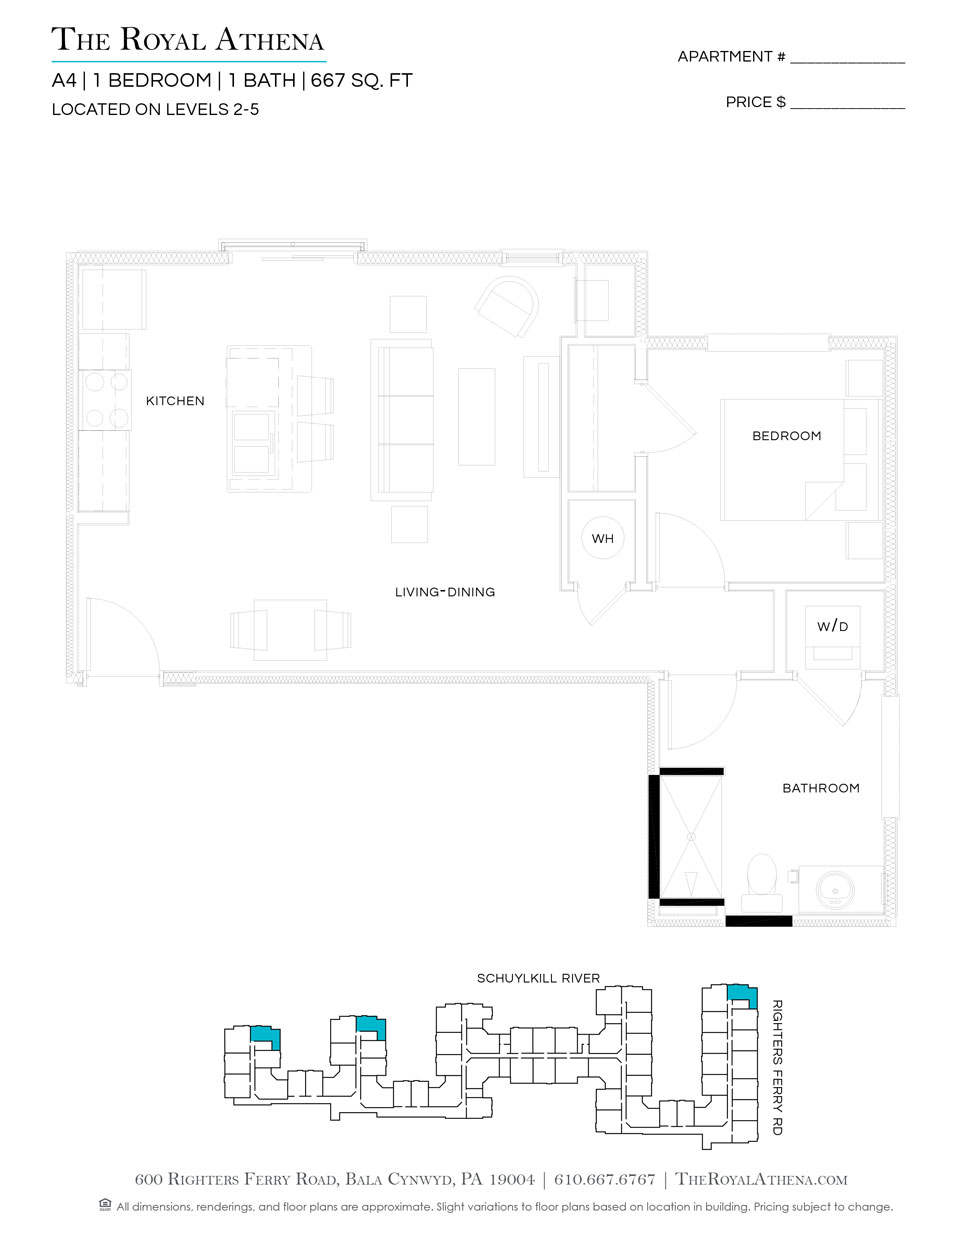 P0659218 a4 2 floorplan 1